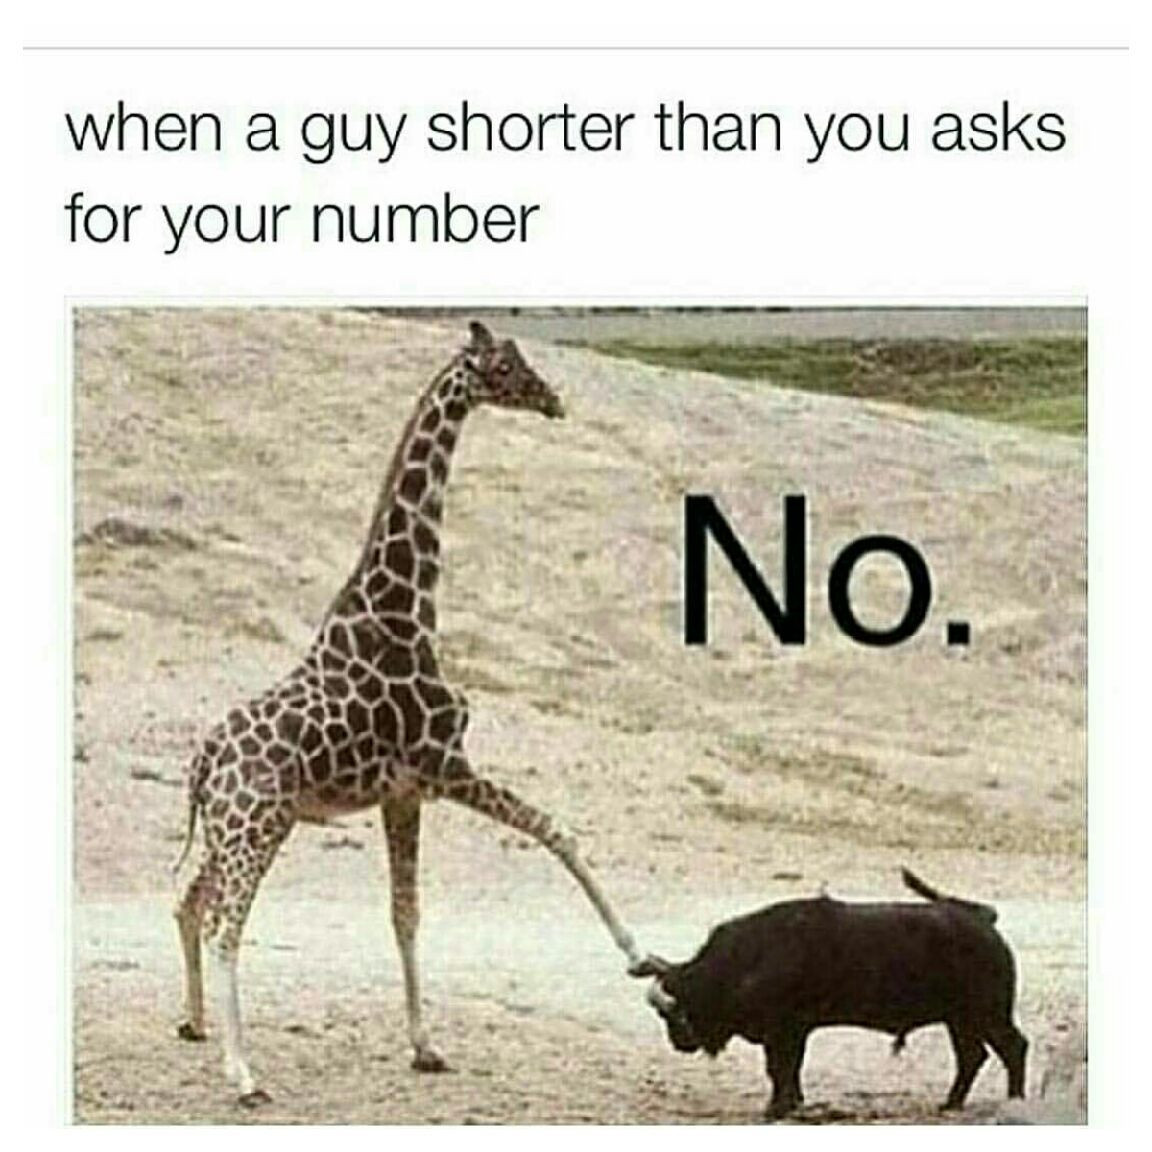 No no nooooo